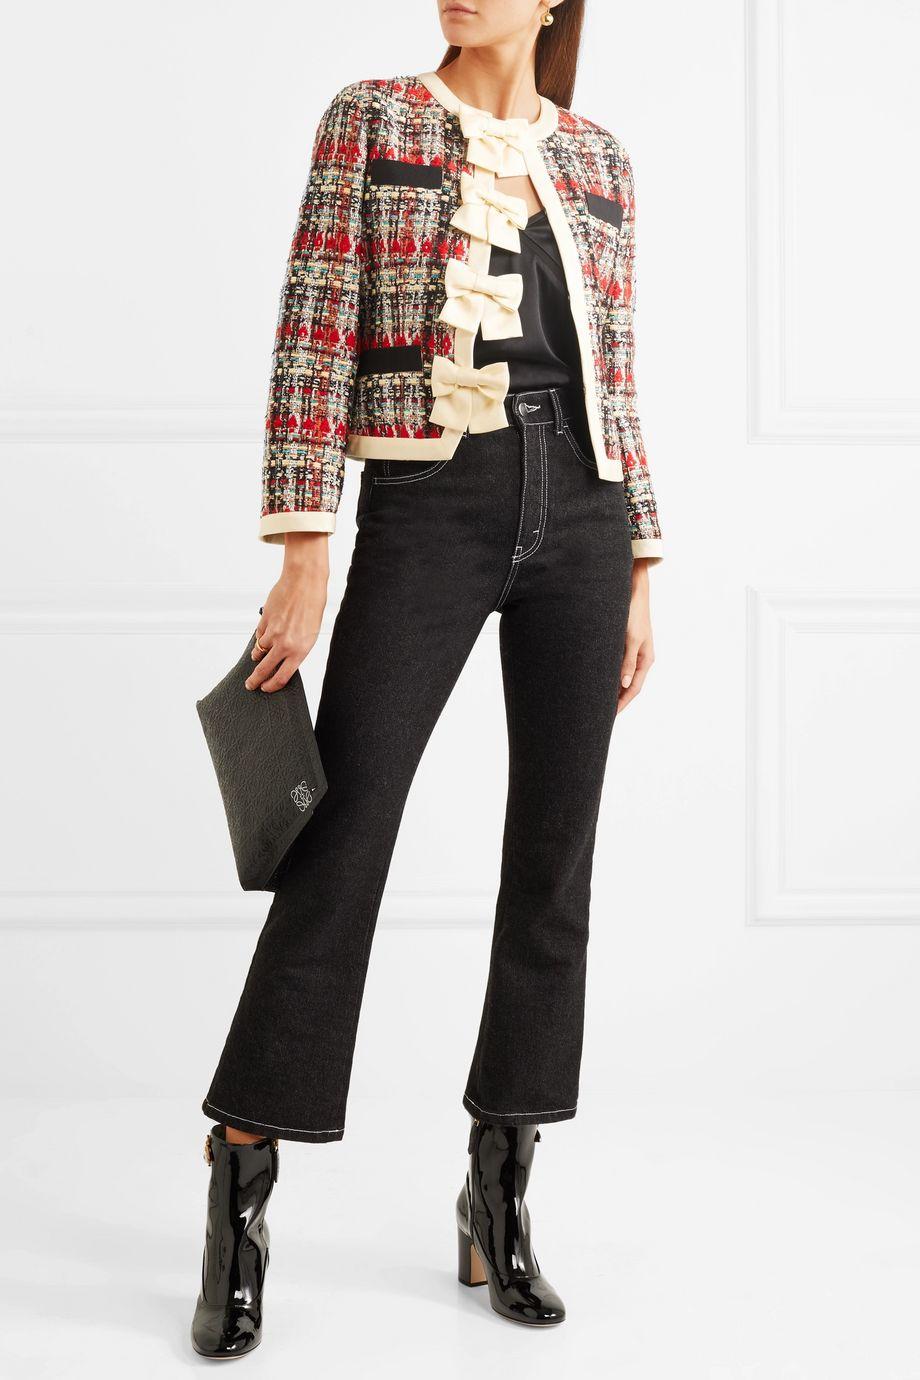 Gucci Silk-twill and grosgrain-trimmed metallic tweed jacket